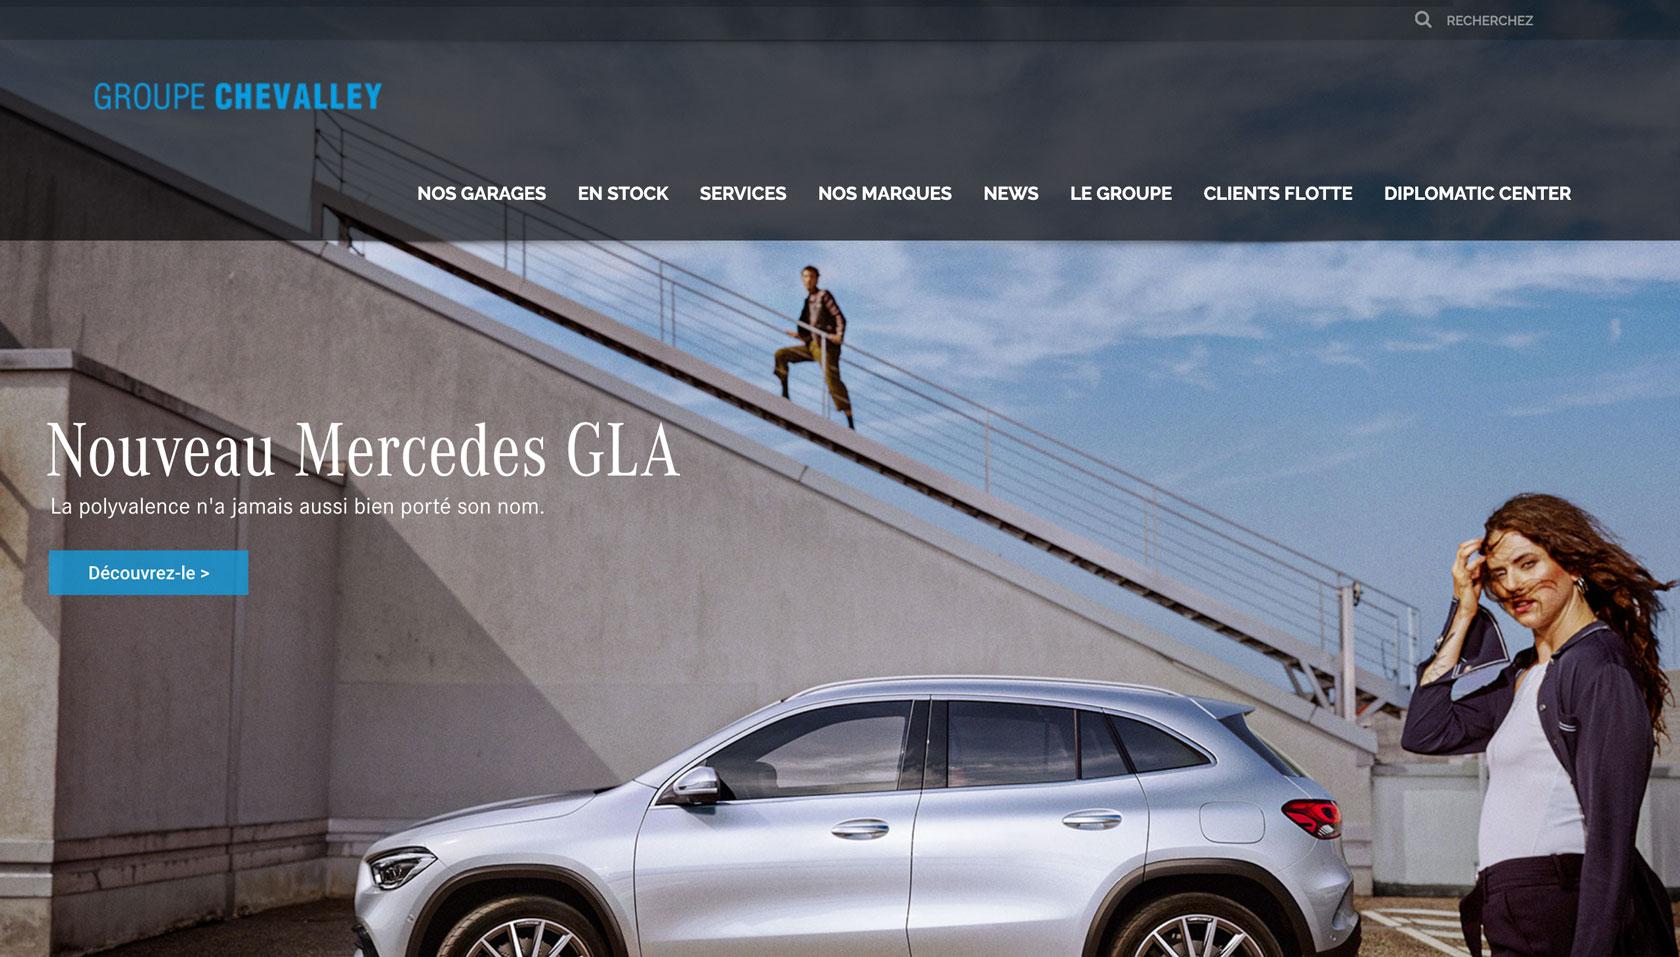 Meilleur site internet automobile 2019 !